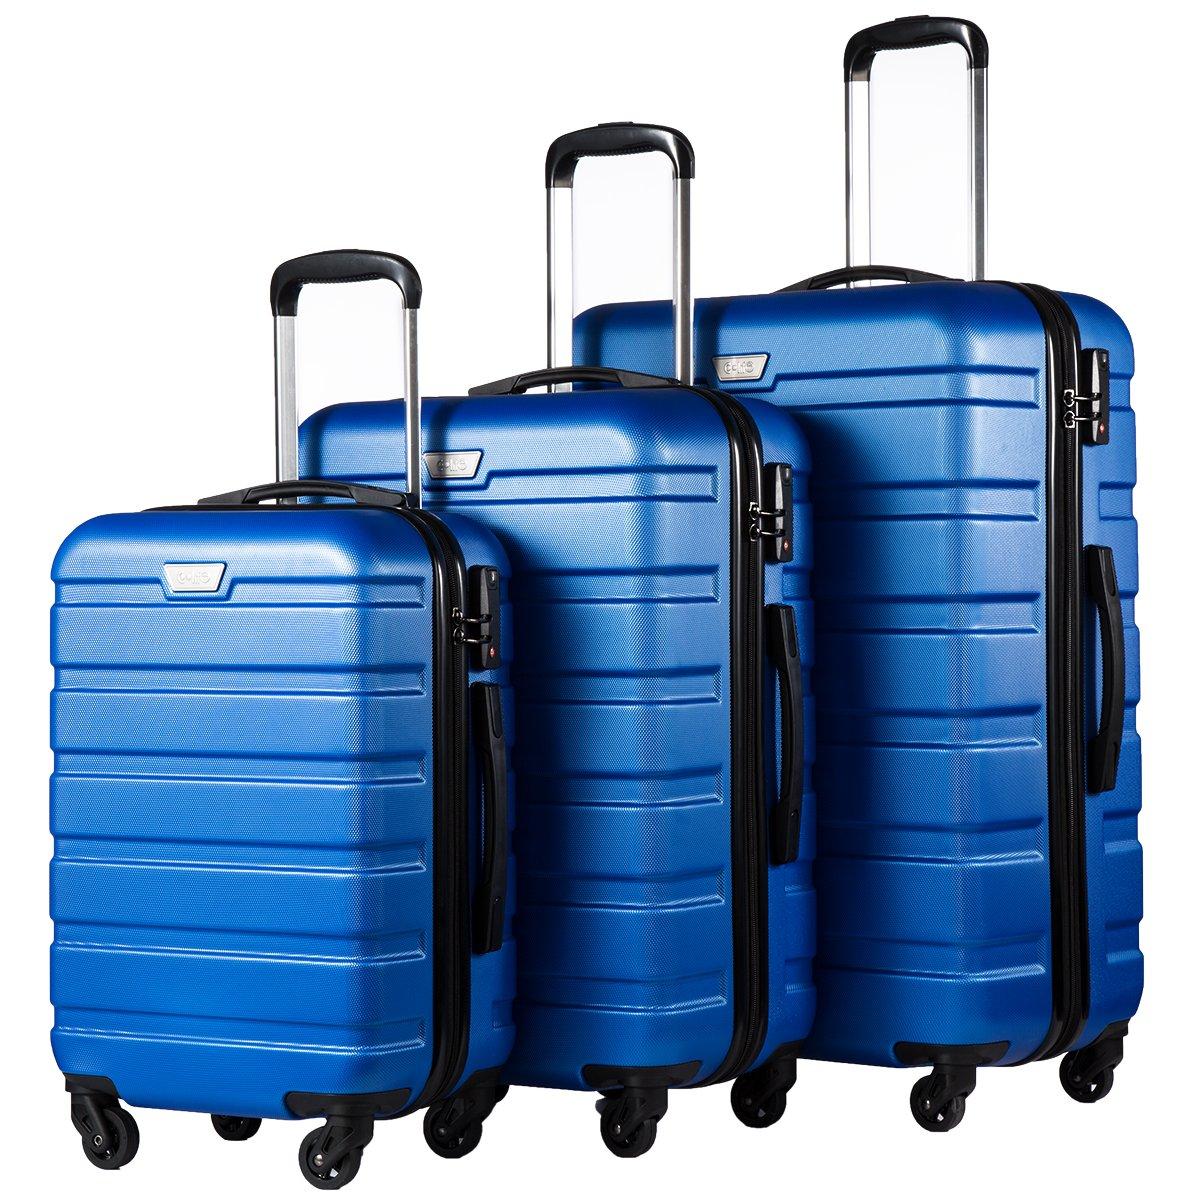 COOLIFE Luggage 3 Piece Set Suitcase Spinner Hardshell Lightweight TSA Lock (Blue) by Coolife